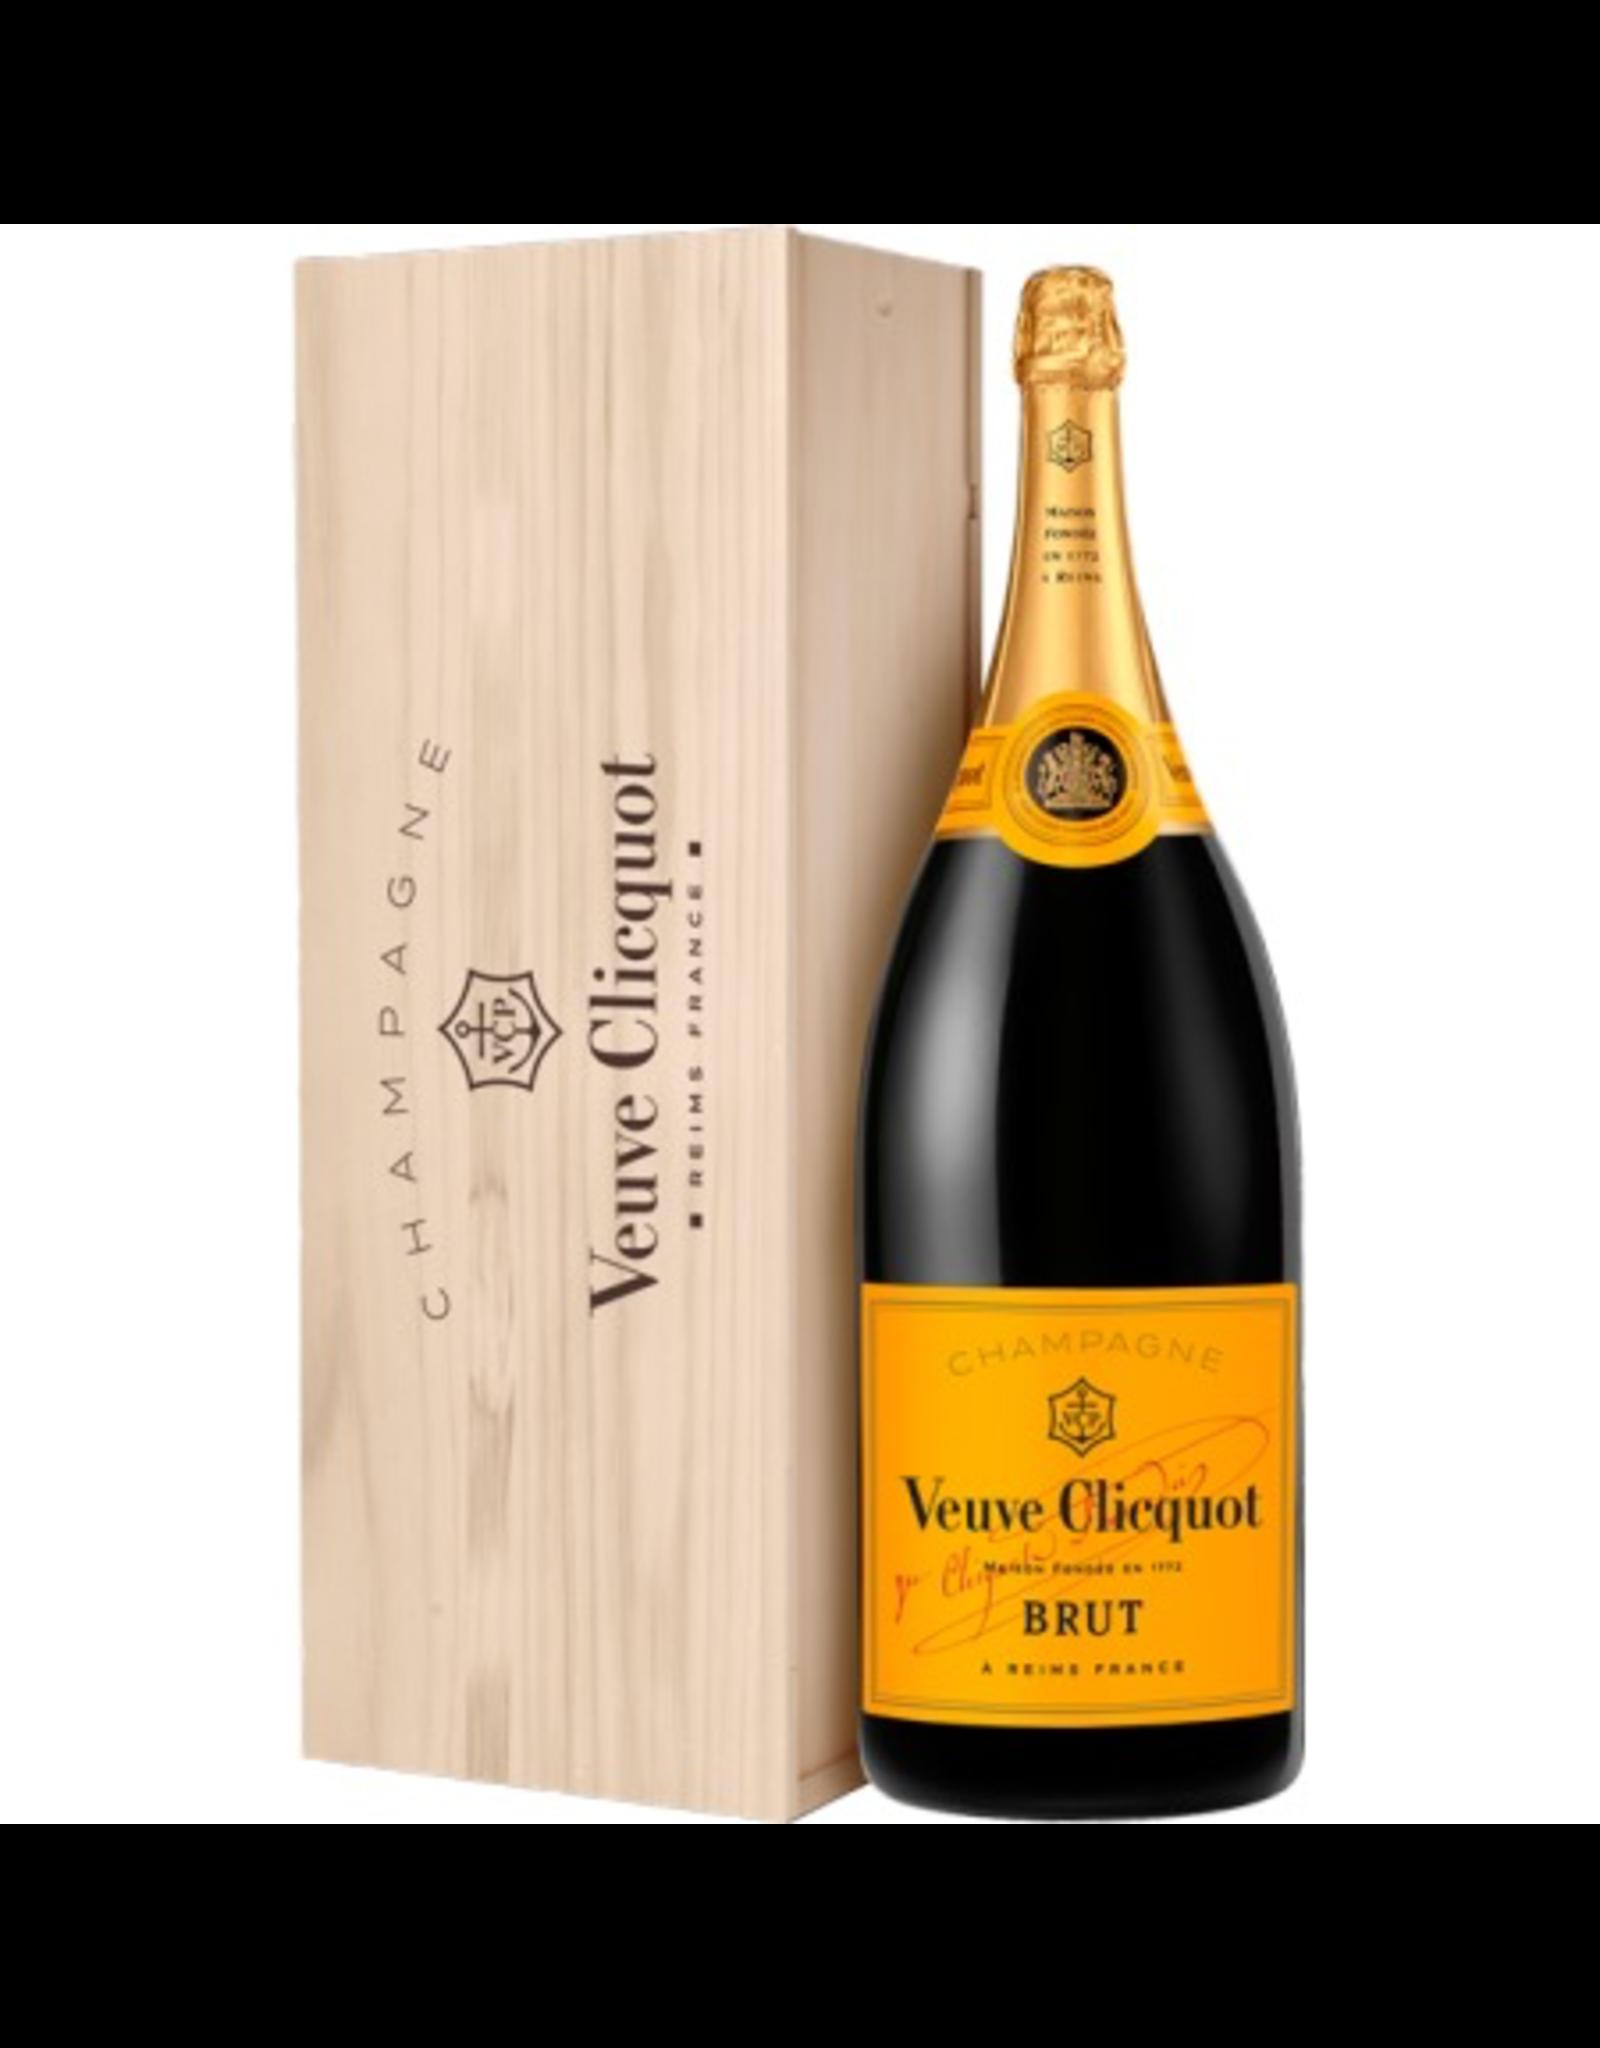 Sparkling Wine NV, 3L Jeroboam (Double Magnum) Veuve Clicquot Ponsardin Reserve Cuvee Brut Yellow Label w/ WOOD BOX, Champagne, Reims, Champagne, France, 14% Alc, TW90